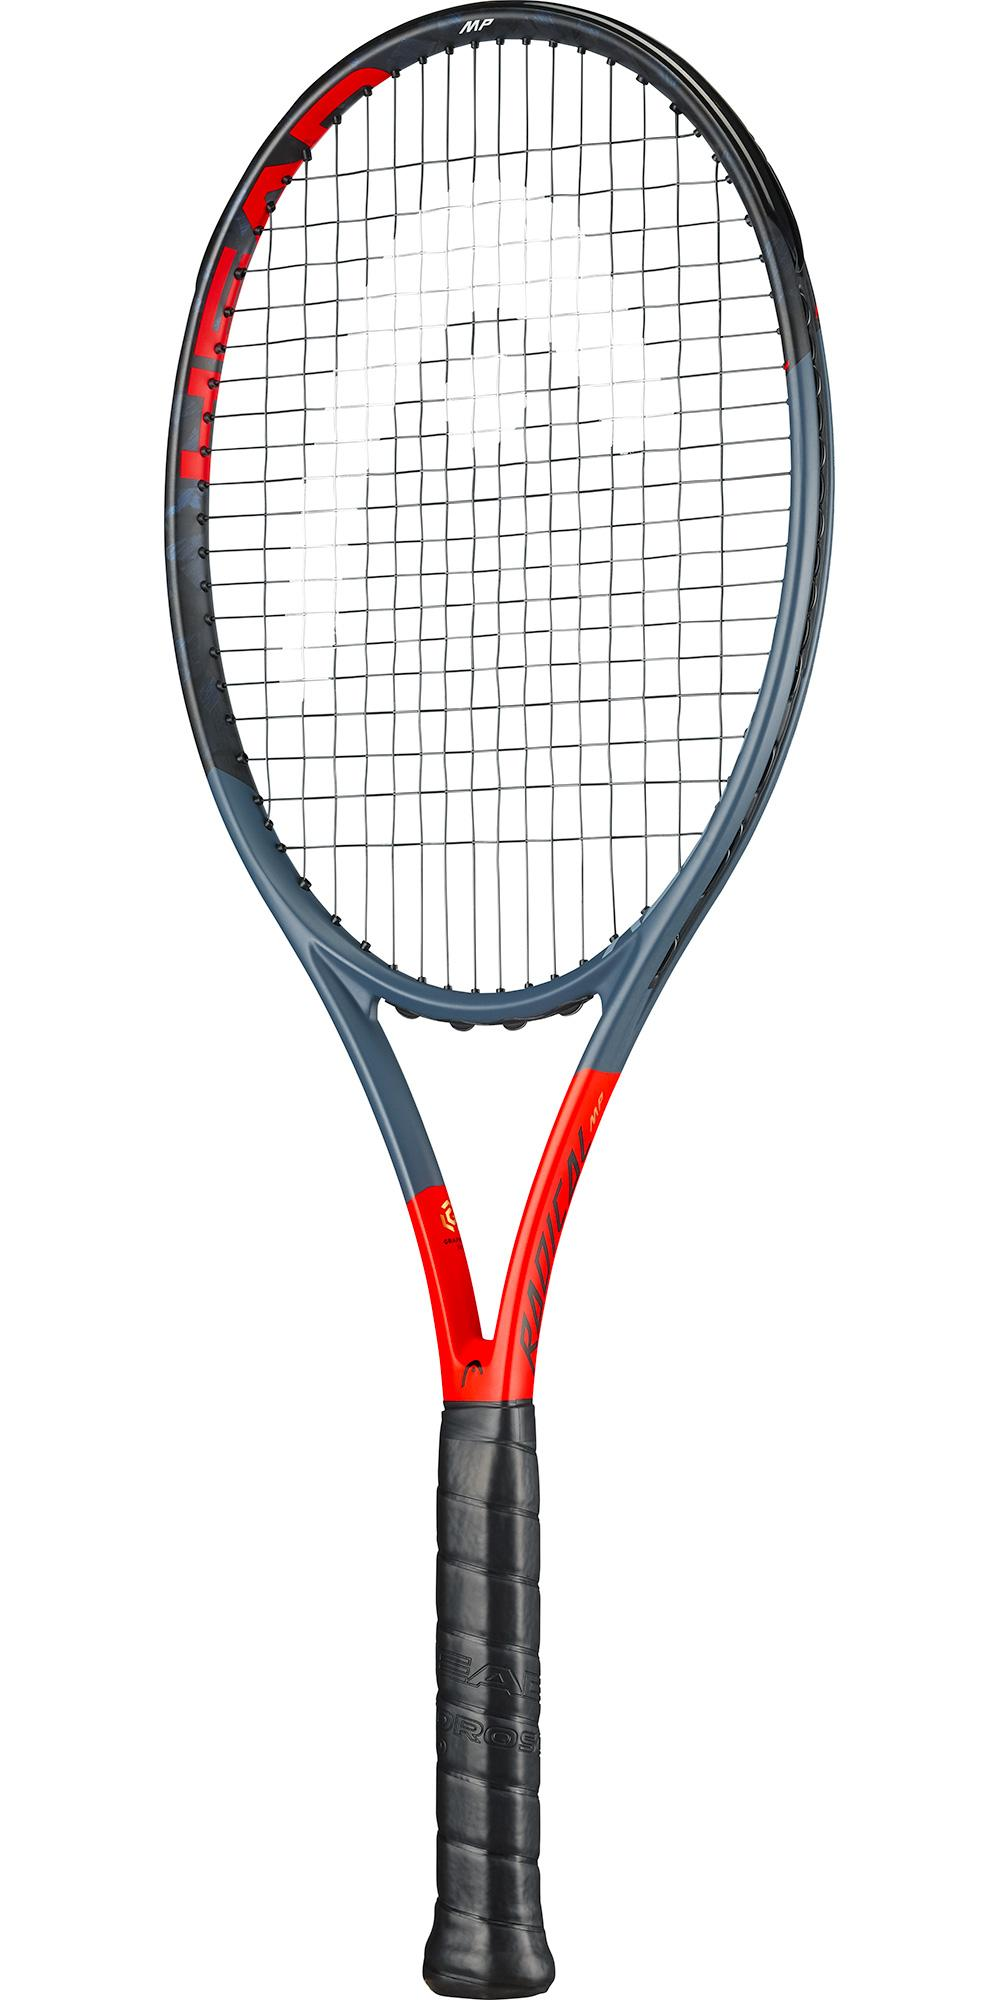 622b27335 Head Graphene 360 Radical MP Tennis Racket - Tennisnuts.com